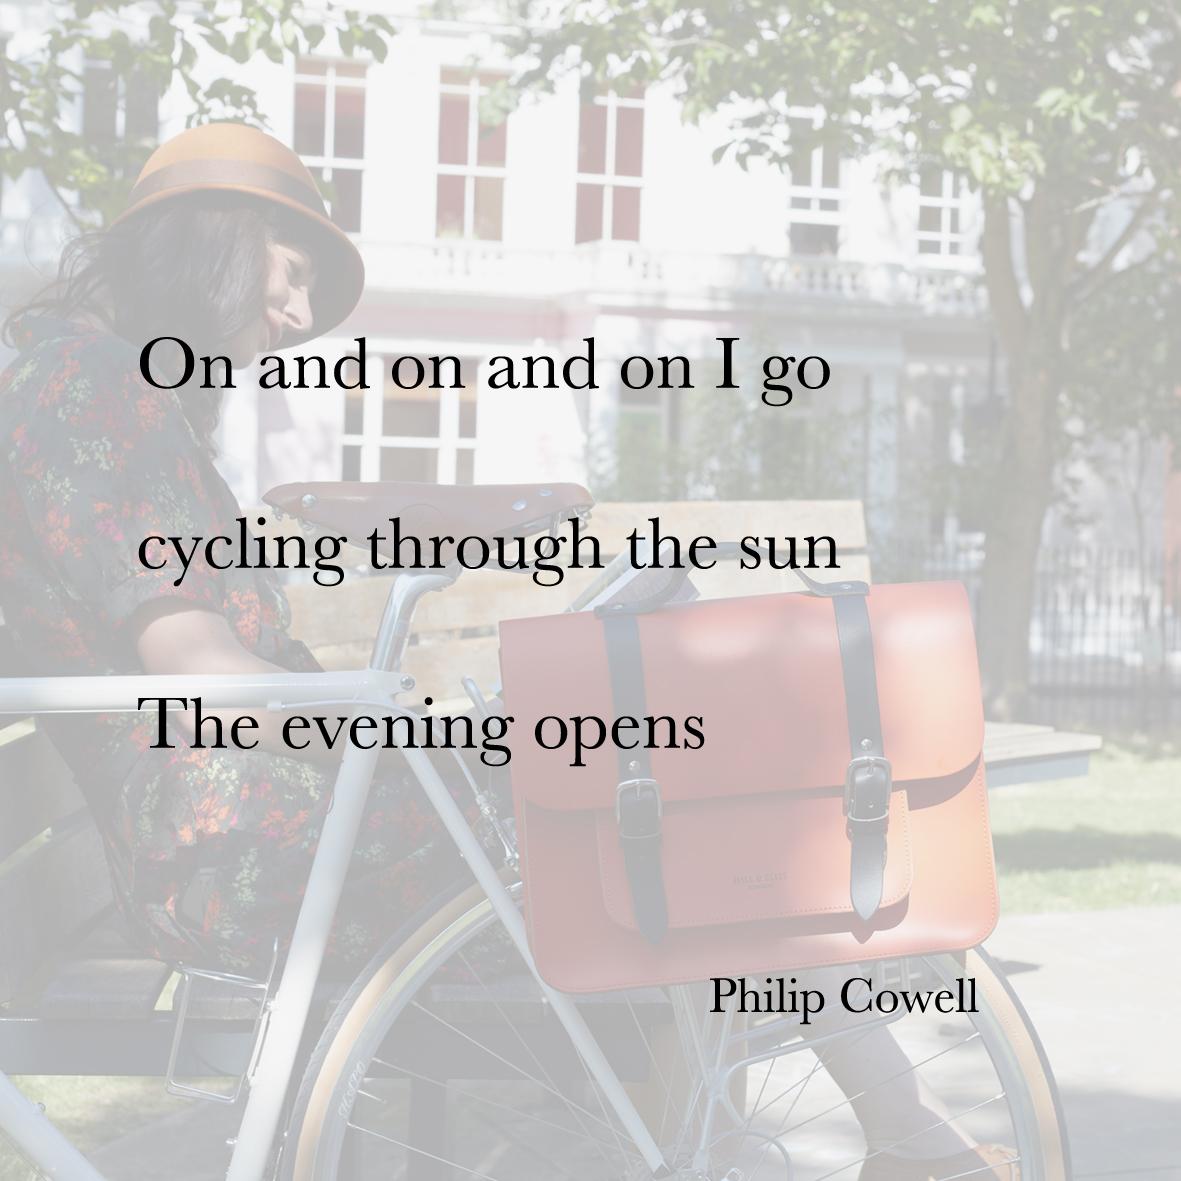 Baiku phil cowell bike bag